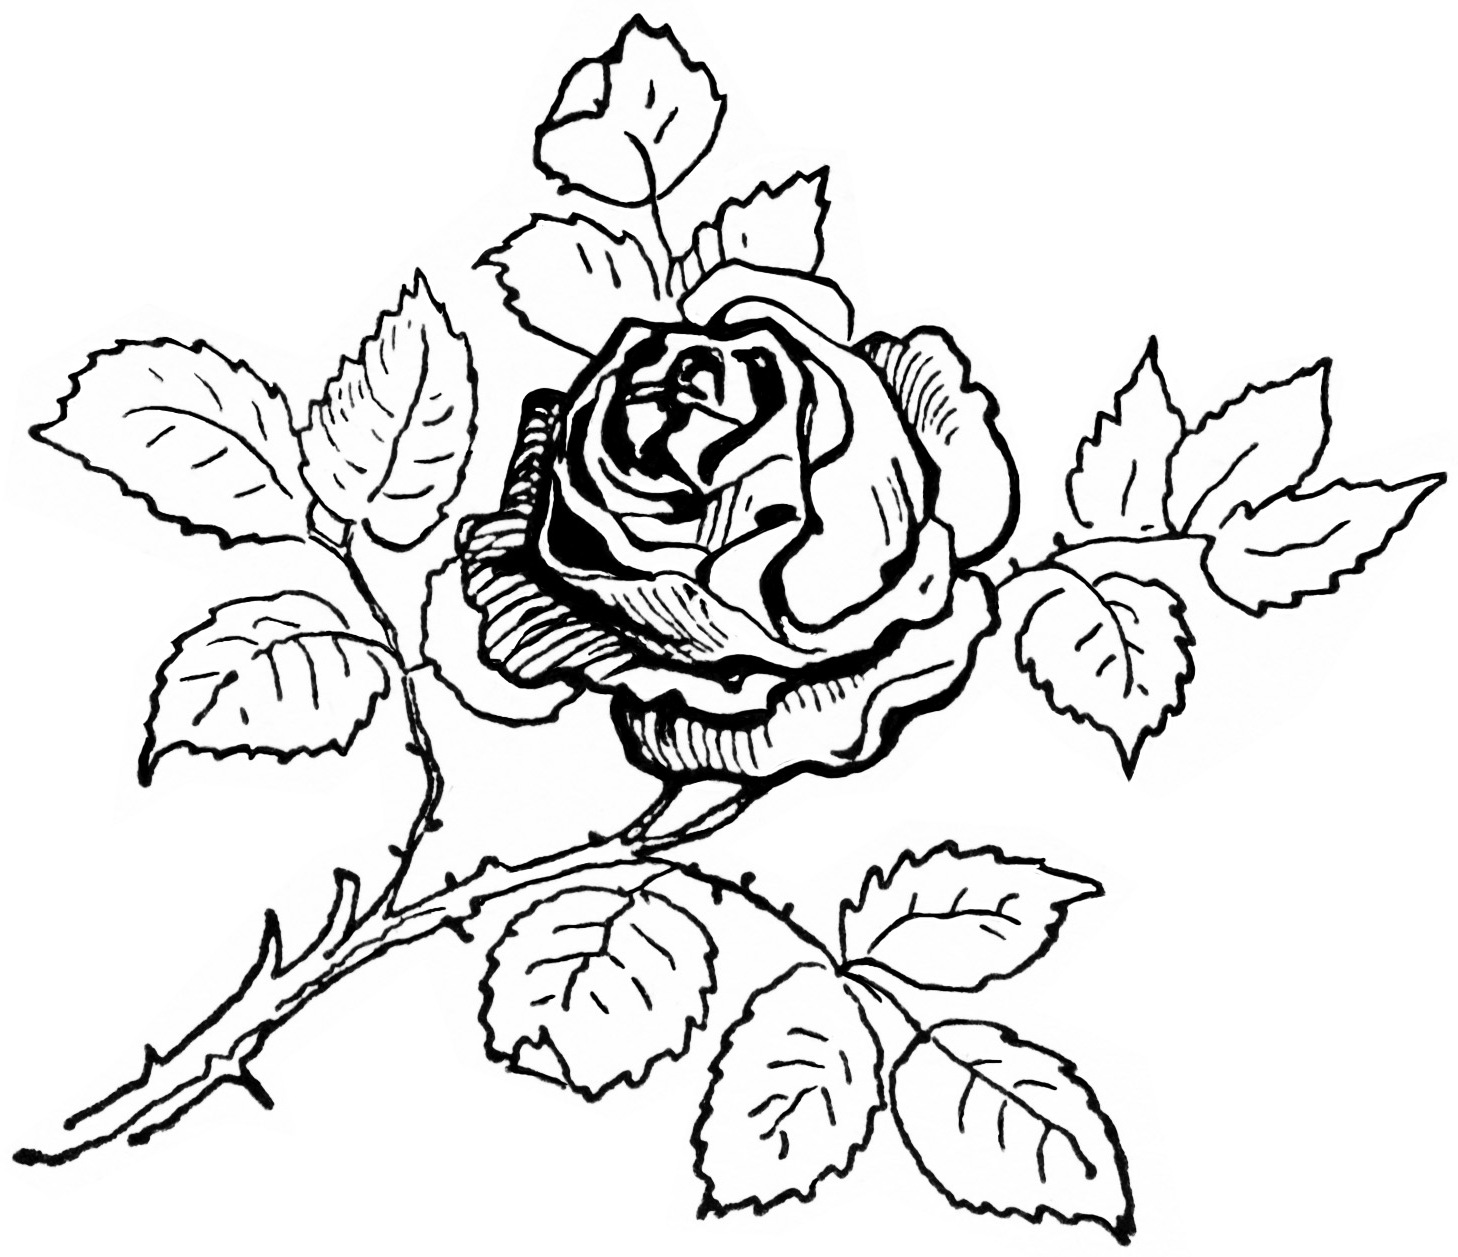 Rose Leaf Drawing at GetDrawings | Free download